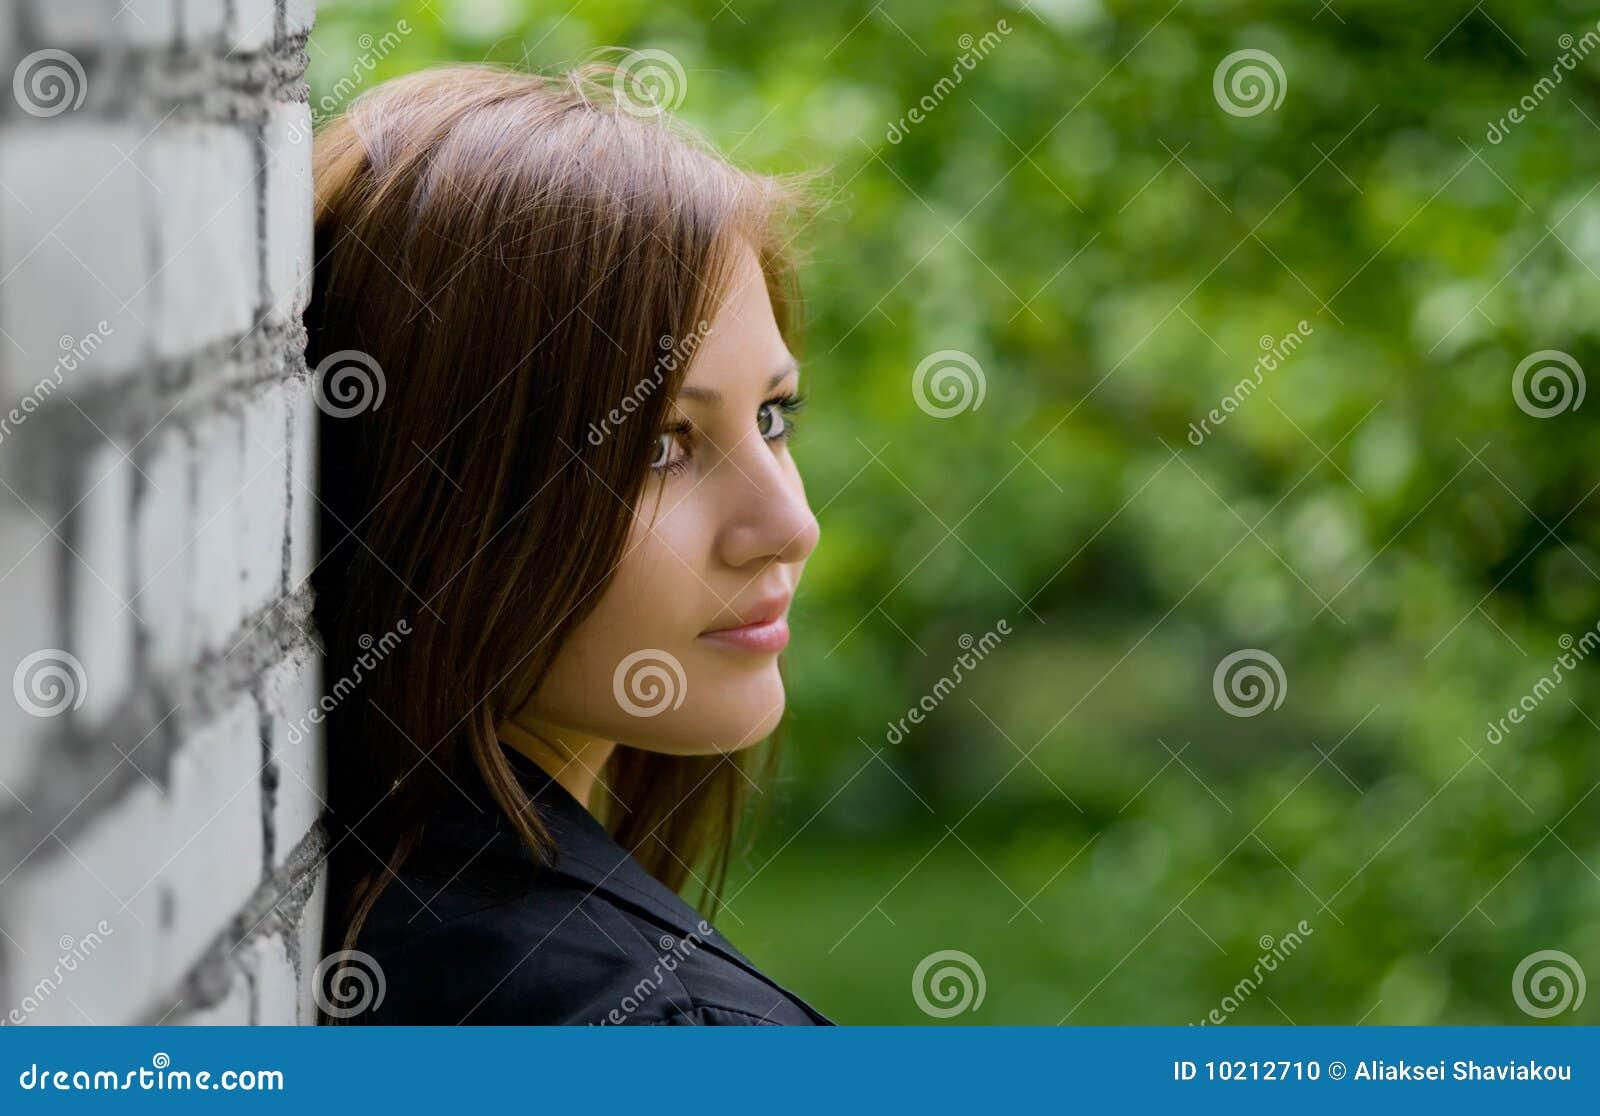 Young Woman Near Brick Wall